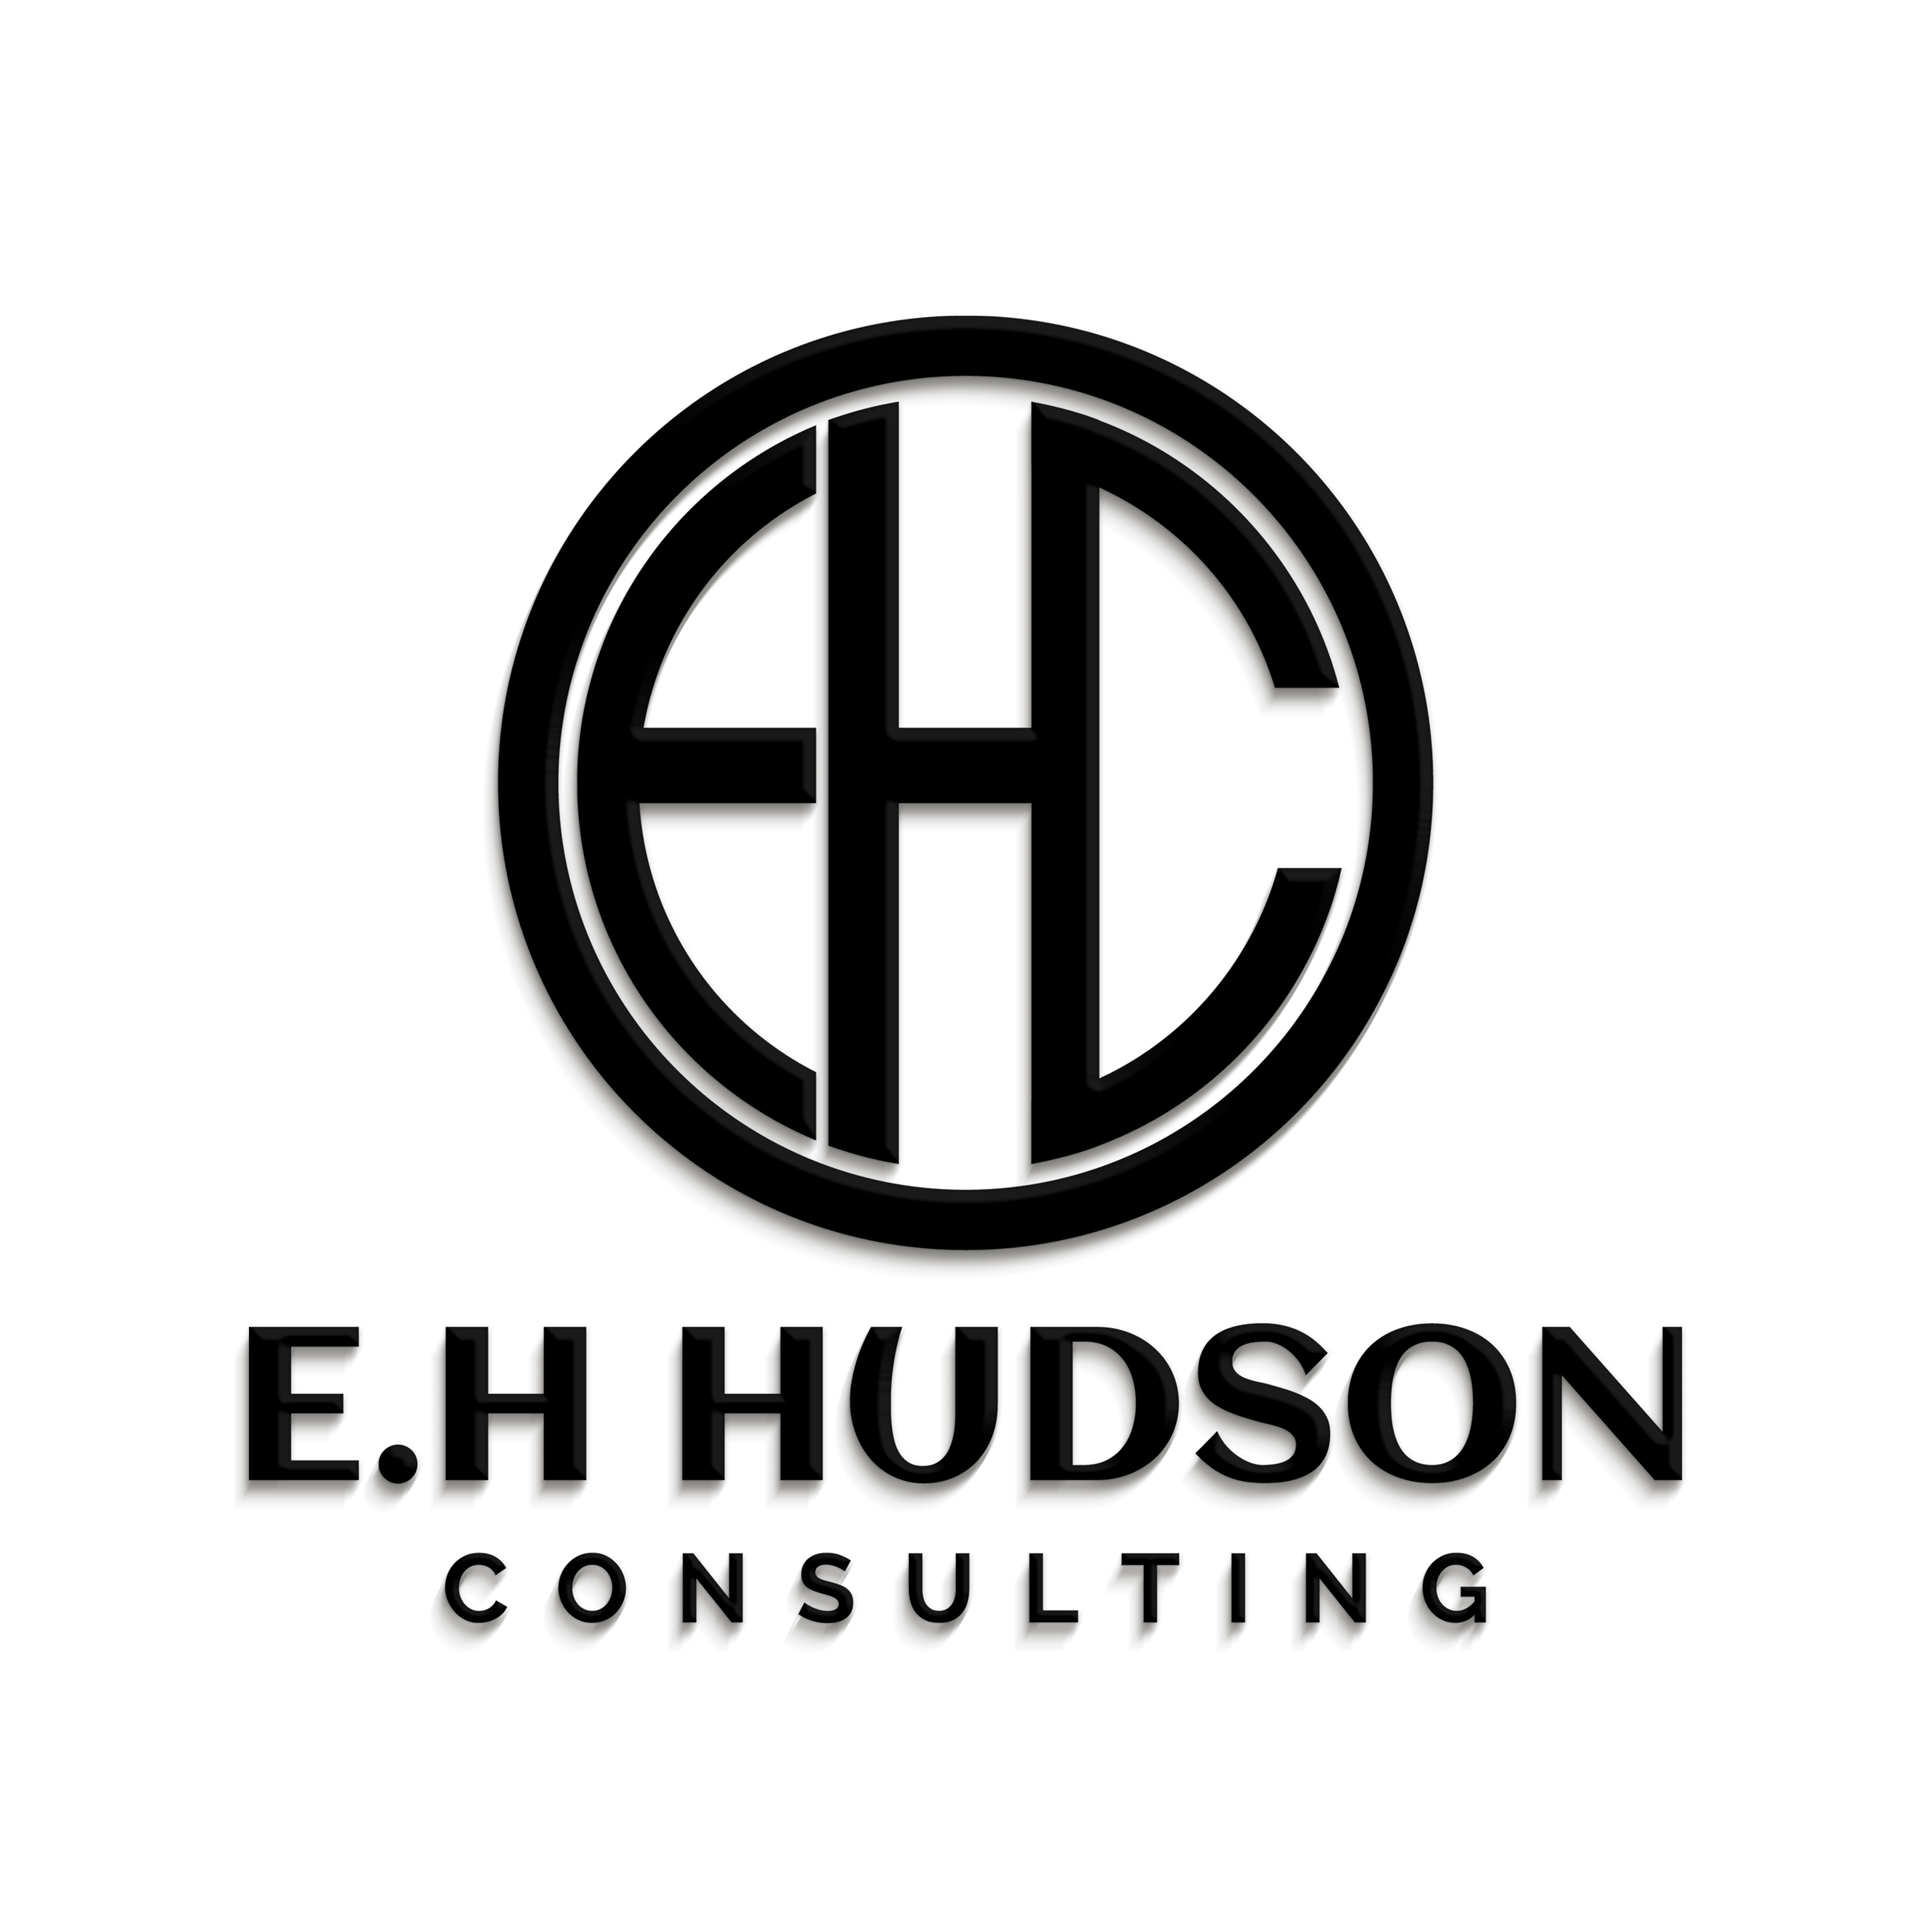 EH Hudson